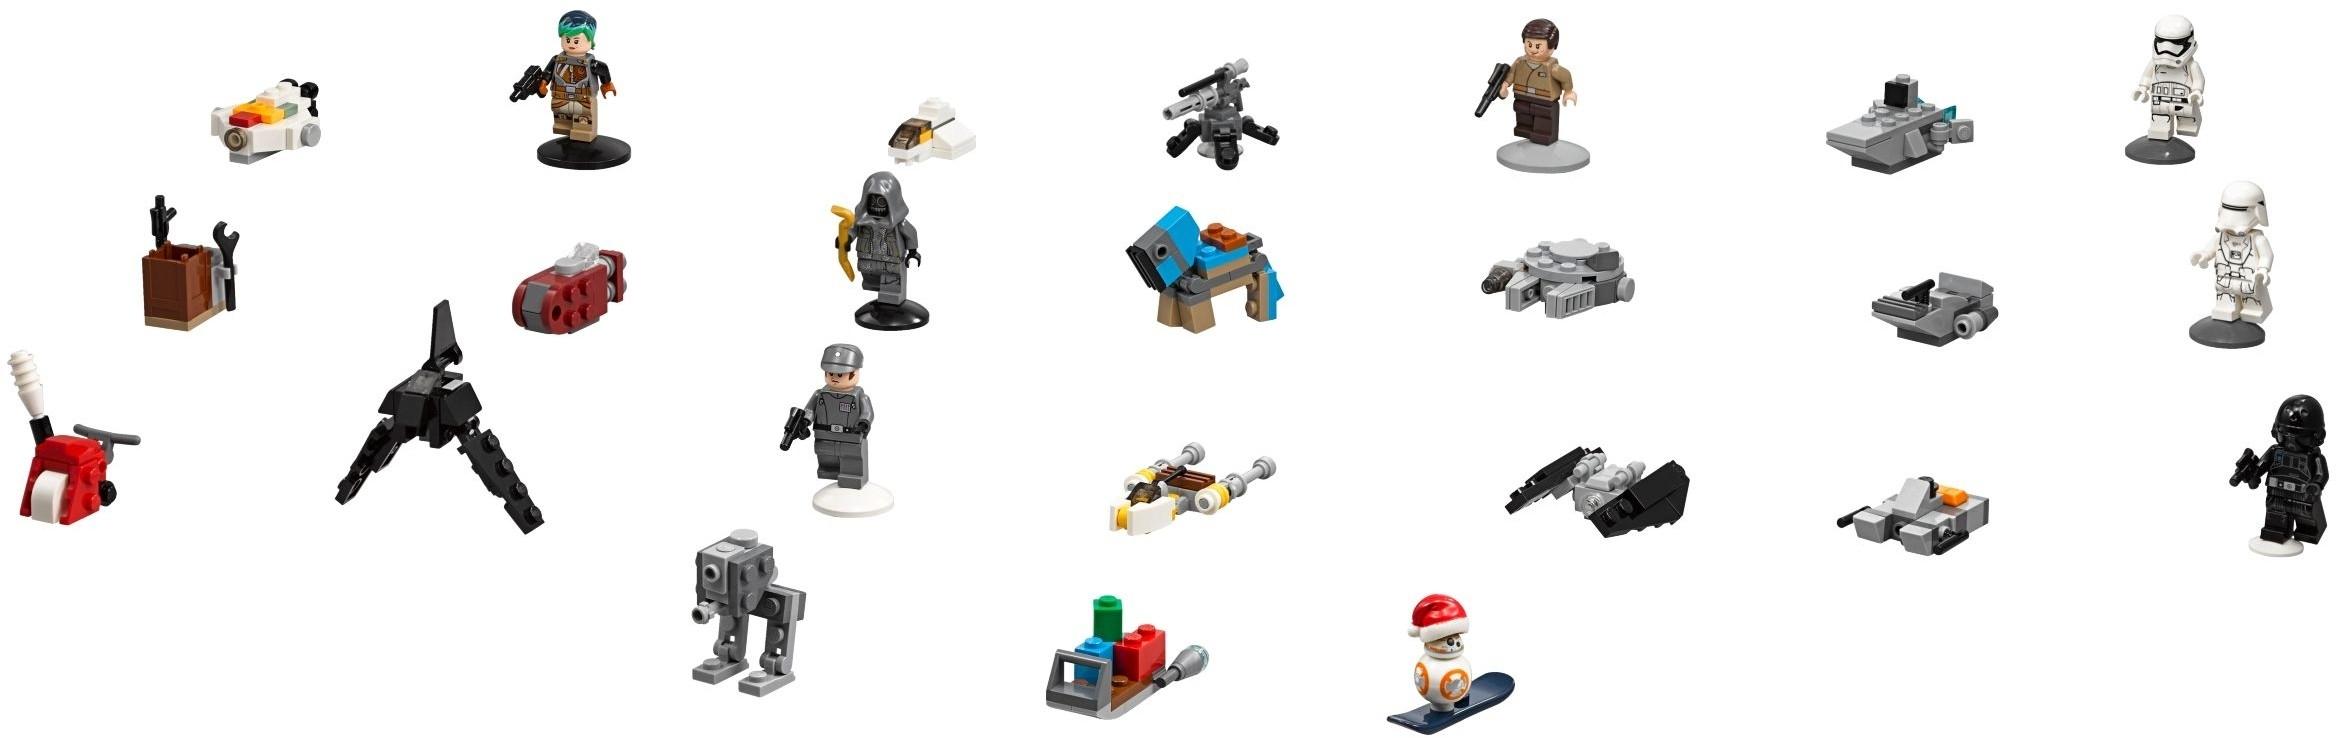 Lego 75184 Star Wars Advent Calendar Instructions, Star Wars within Lego Advent Calendar Star Wars Directions